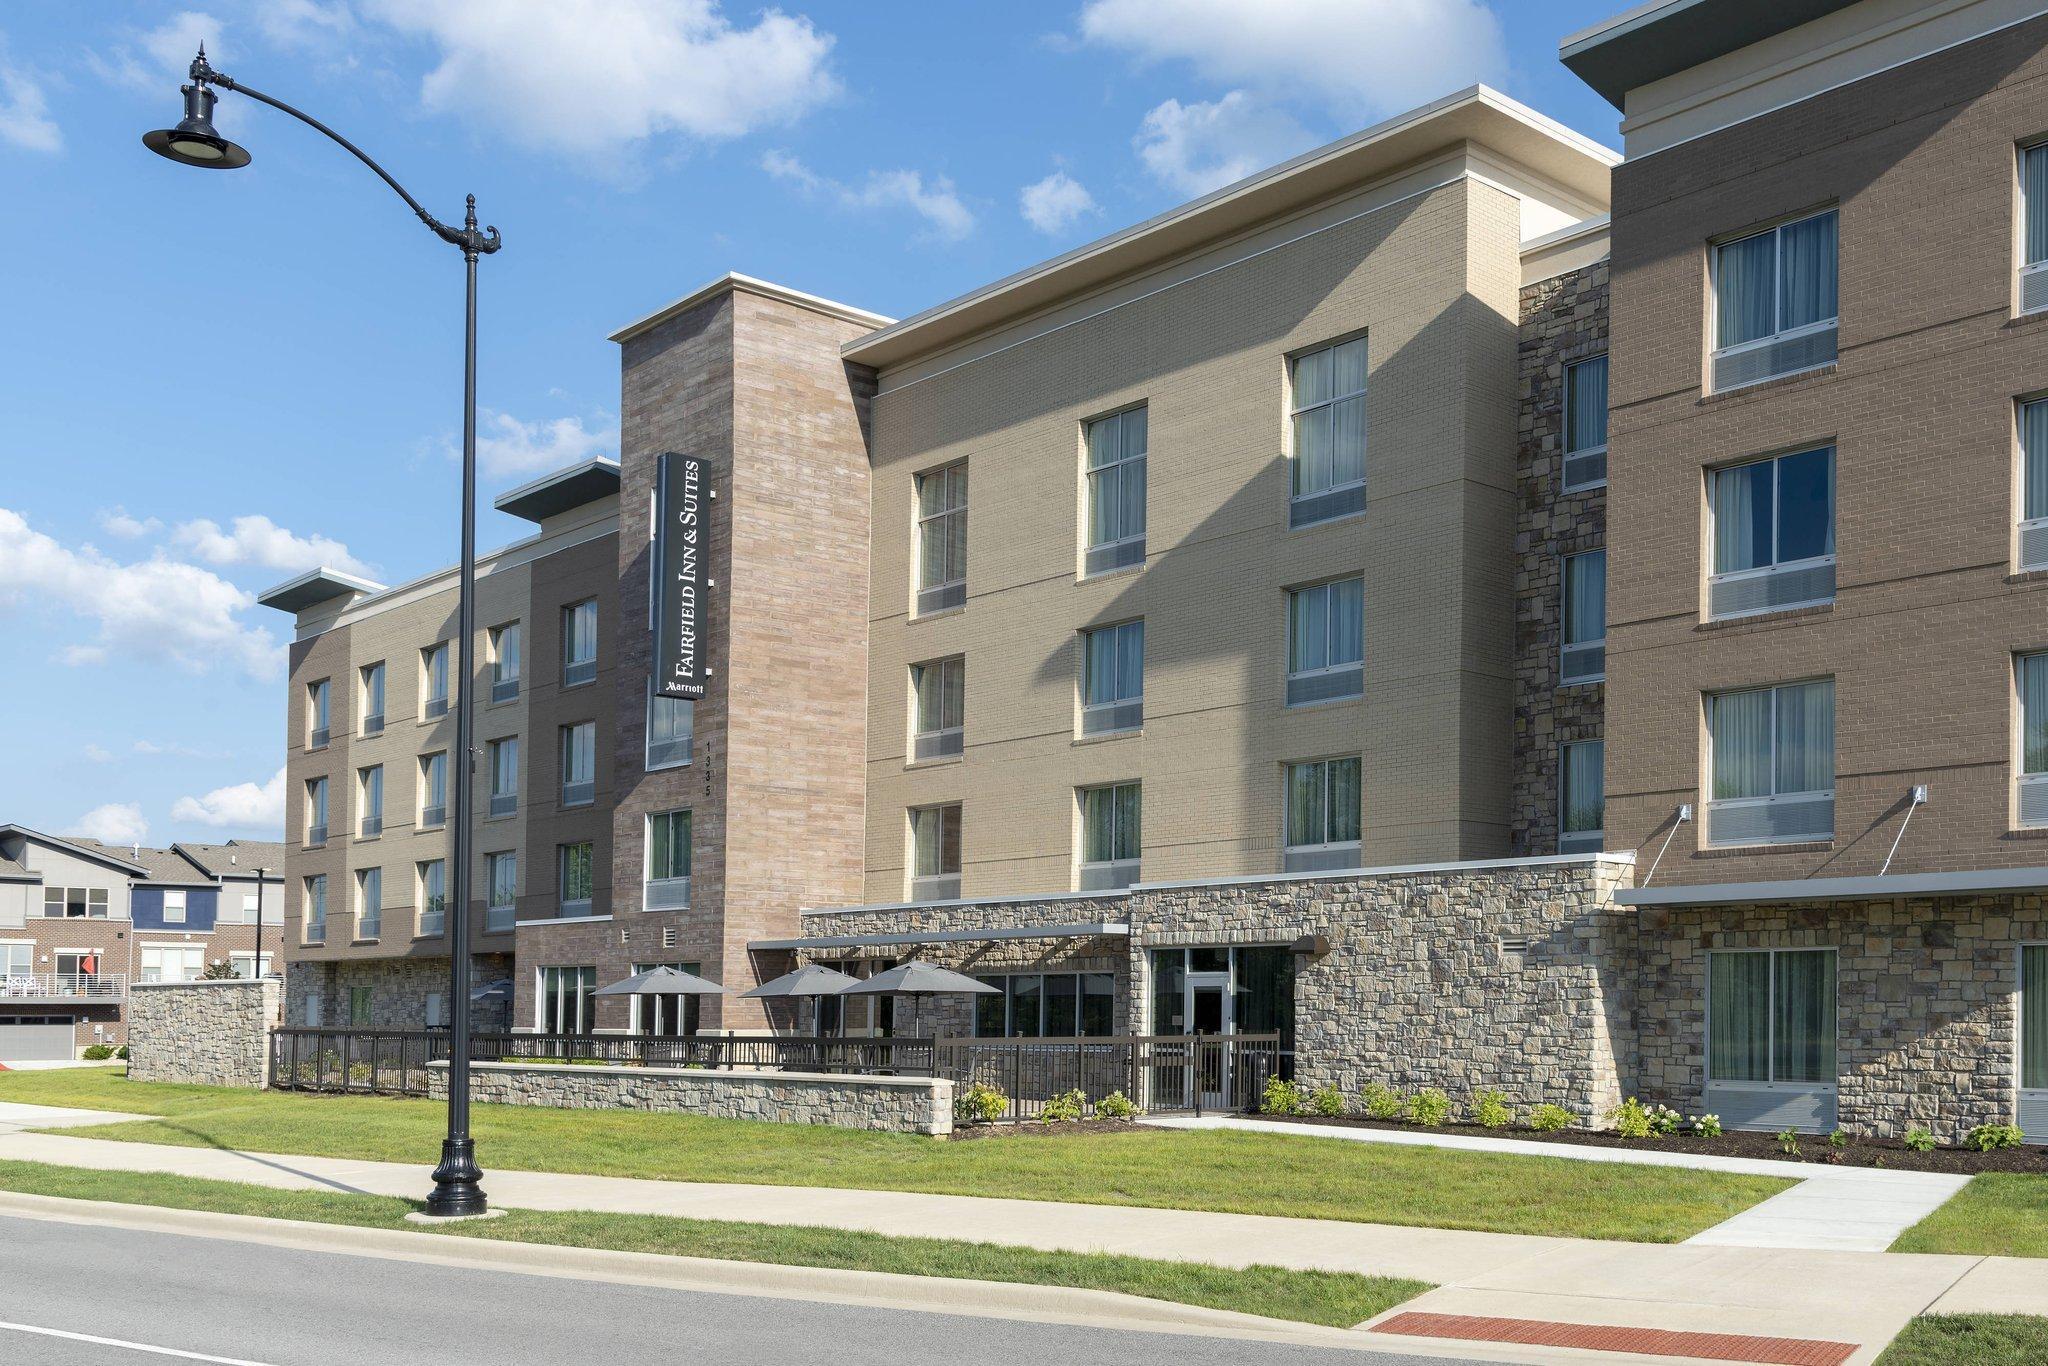 Fairfield Inn And Suites Indianapolis Carmel